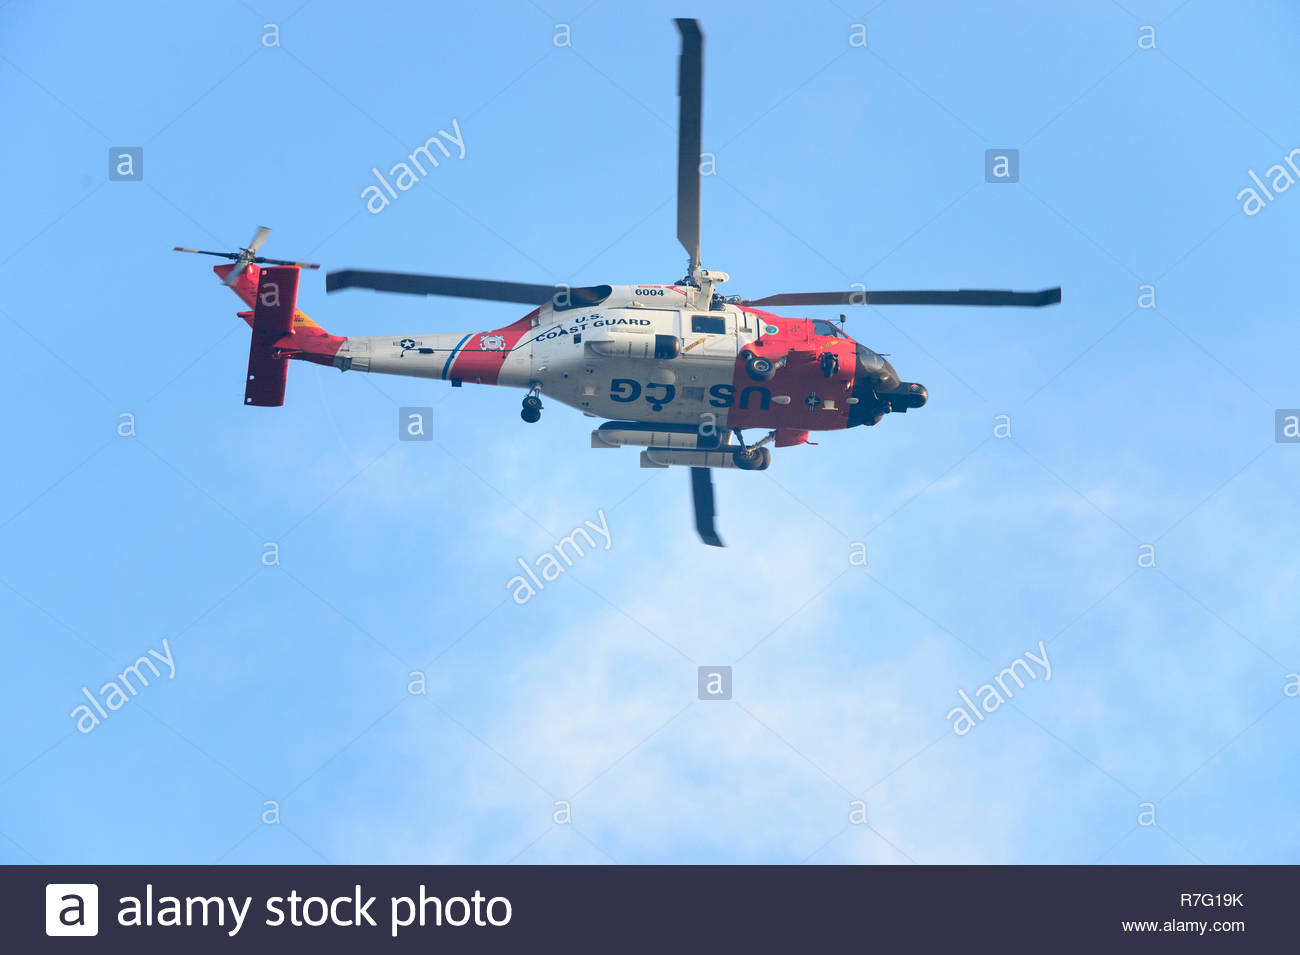 U s  Coast Guard Helicopter Stock Photos & U s  Coast Guard